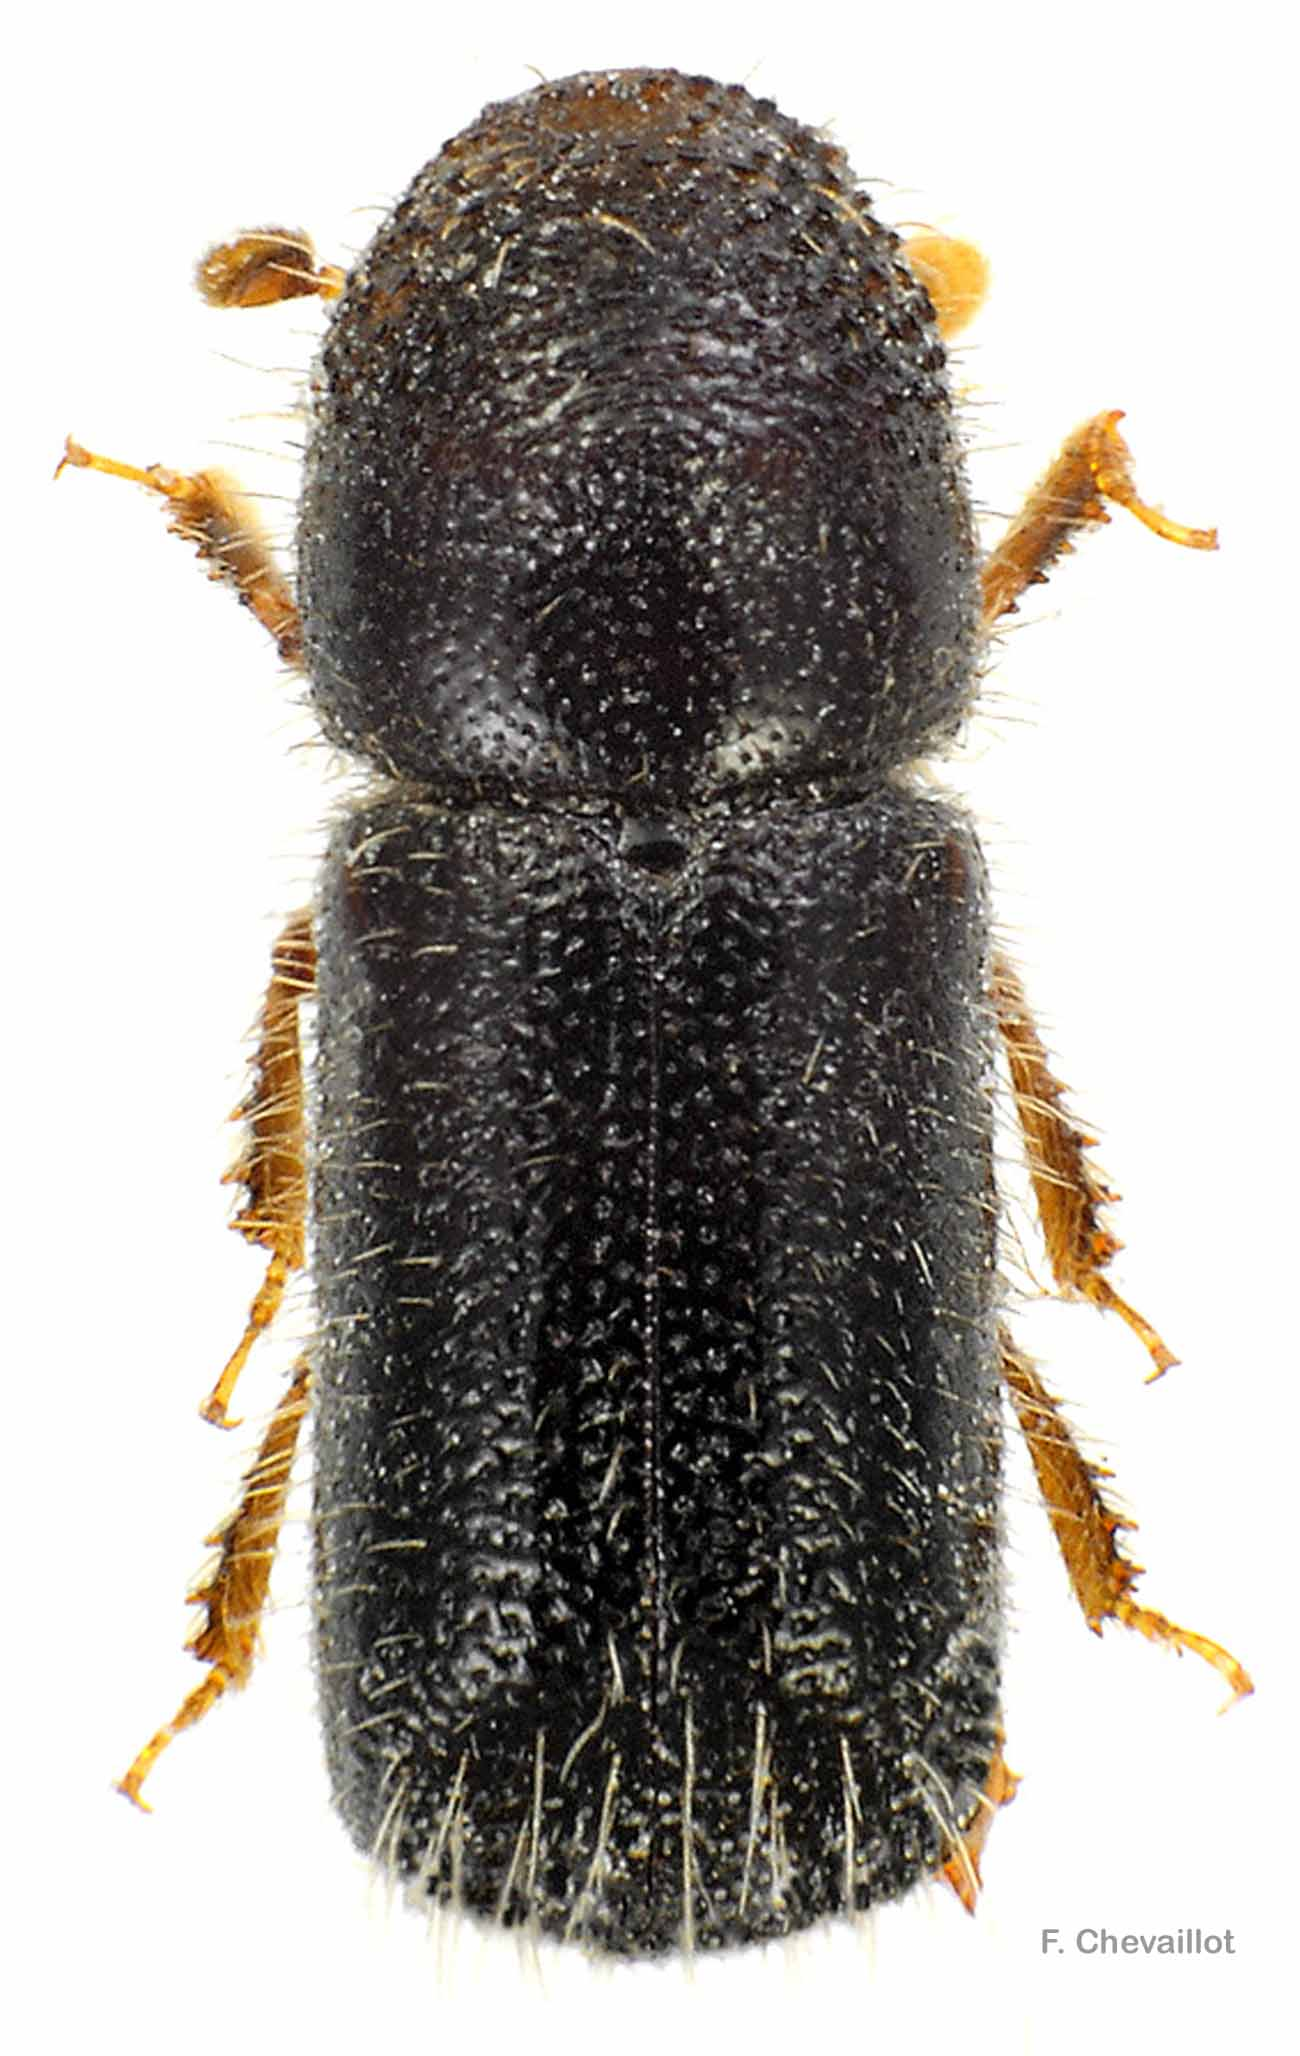 Taphrorychus bicolor